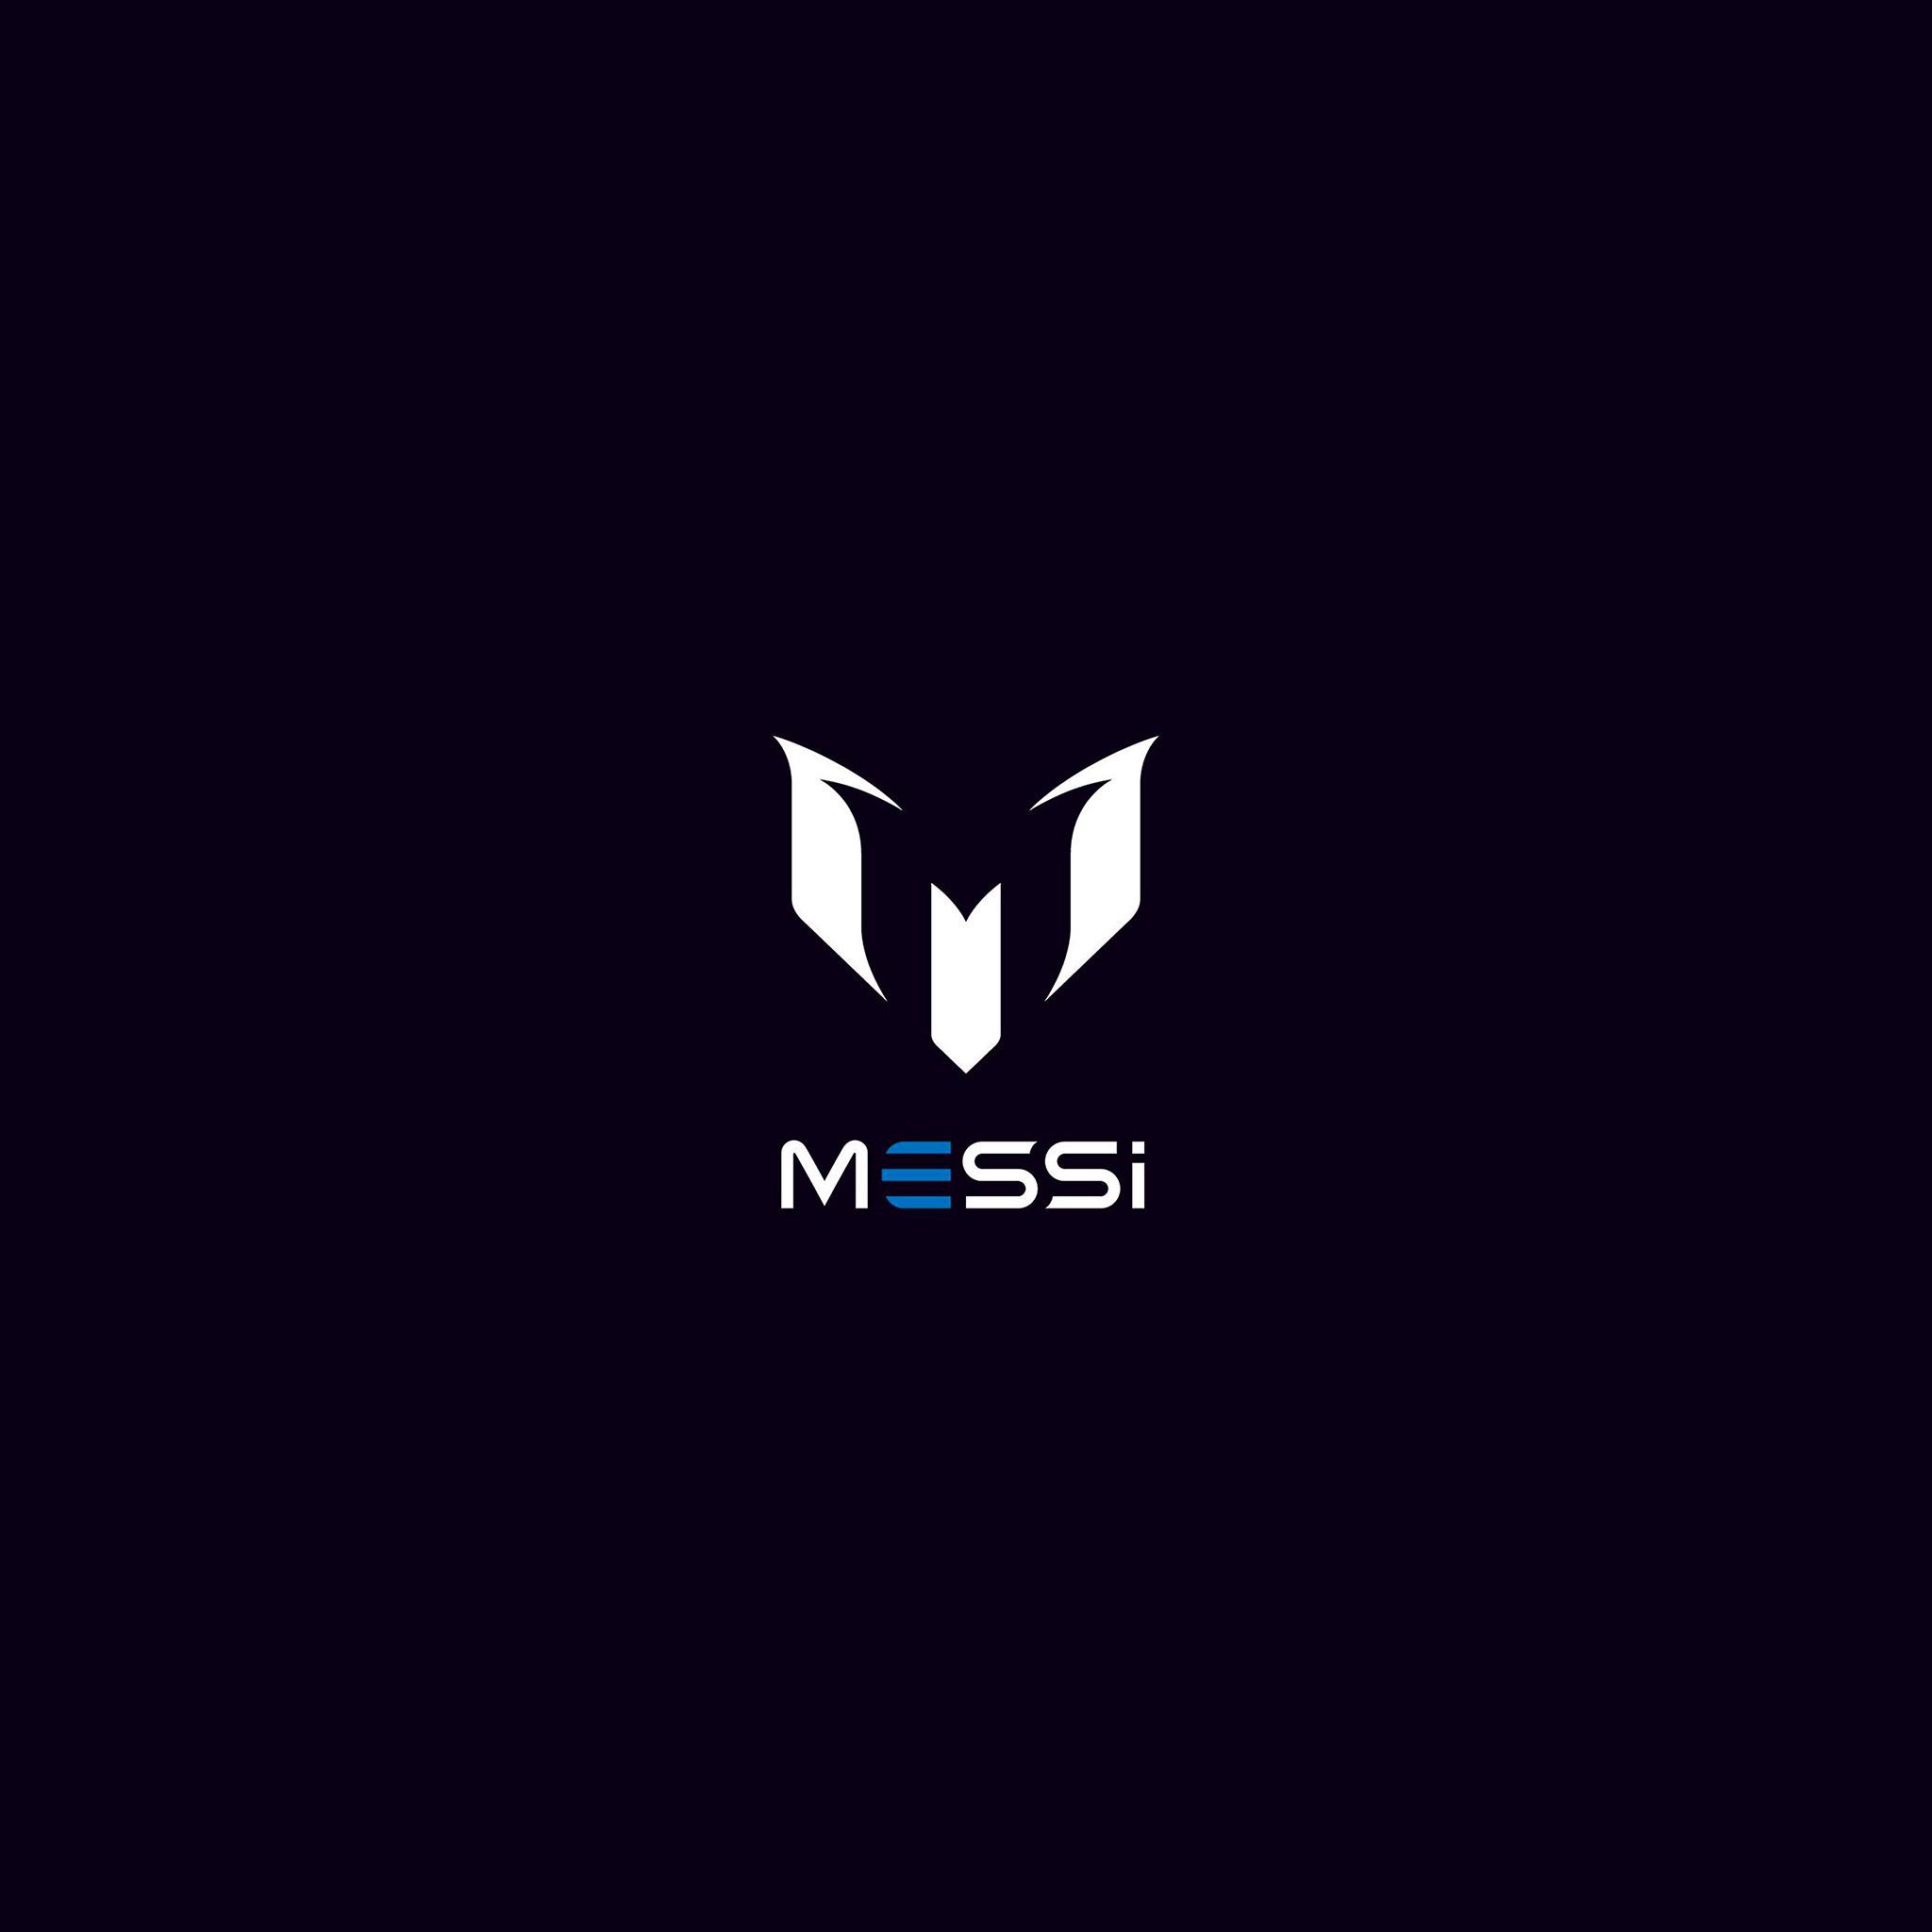 Aq07 messi logo art minimal dark wallpaper for Minimal art logo